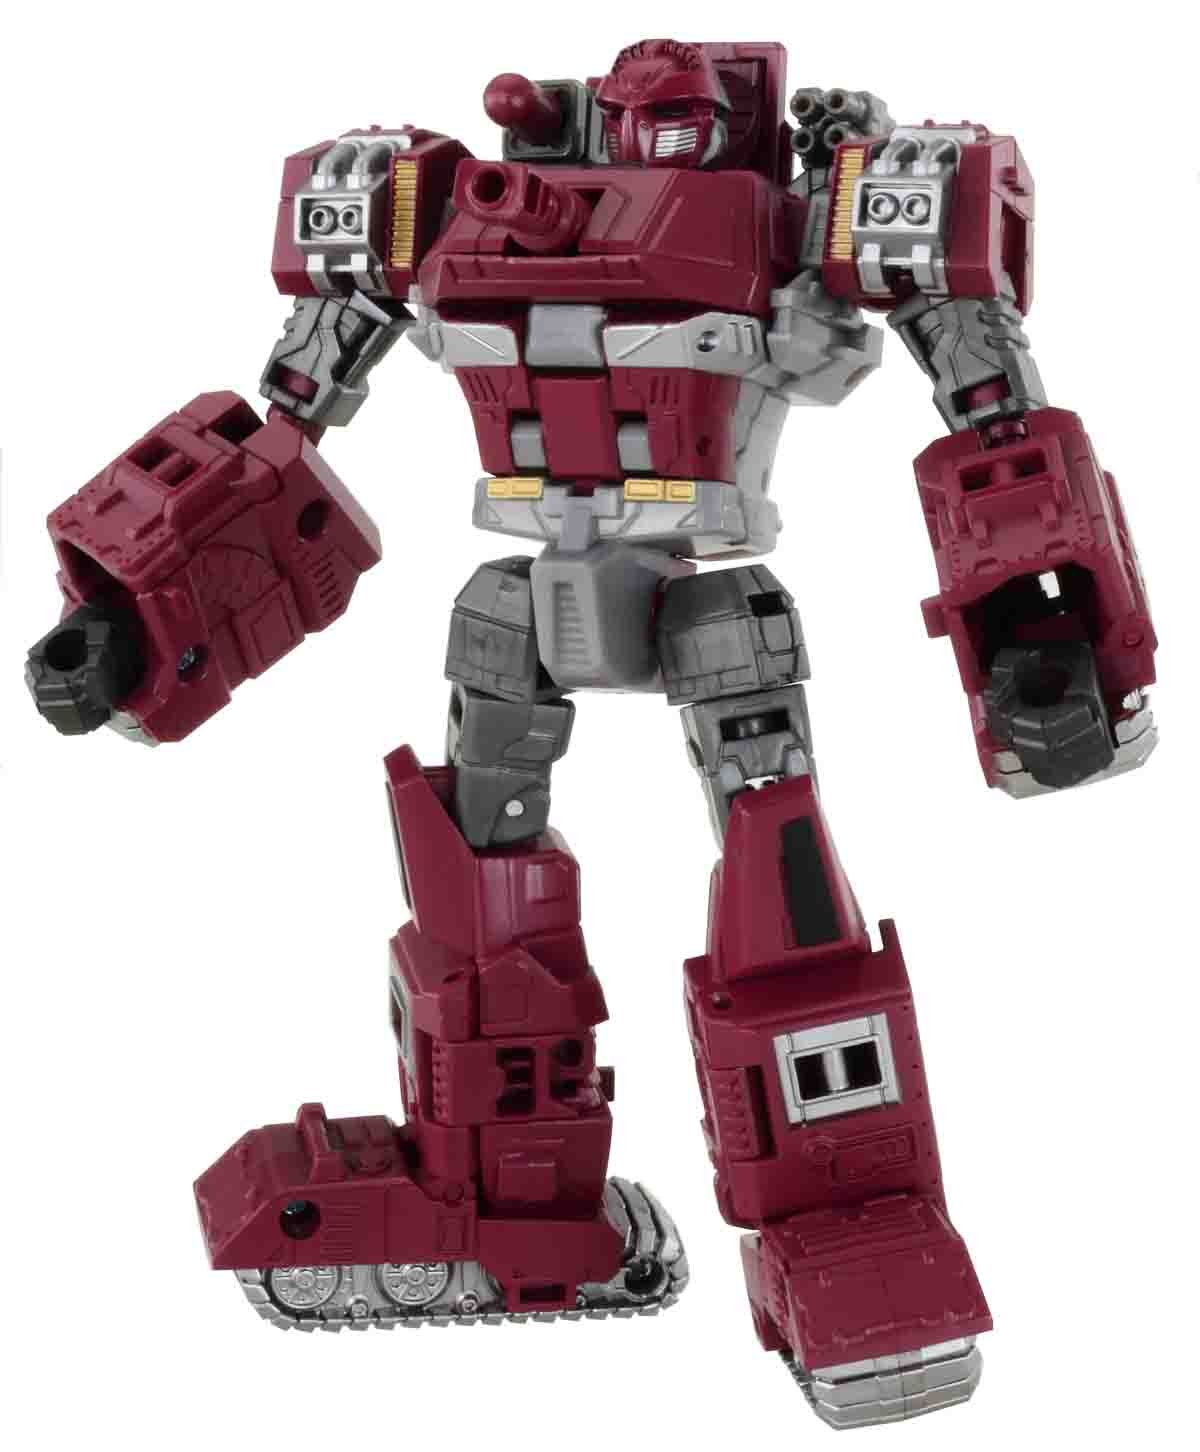 Transformers – GENERATIONS – Deluxe – WARPATH AUTOBOT – Level 3- Hasbro günstig als Geschenk kaufen